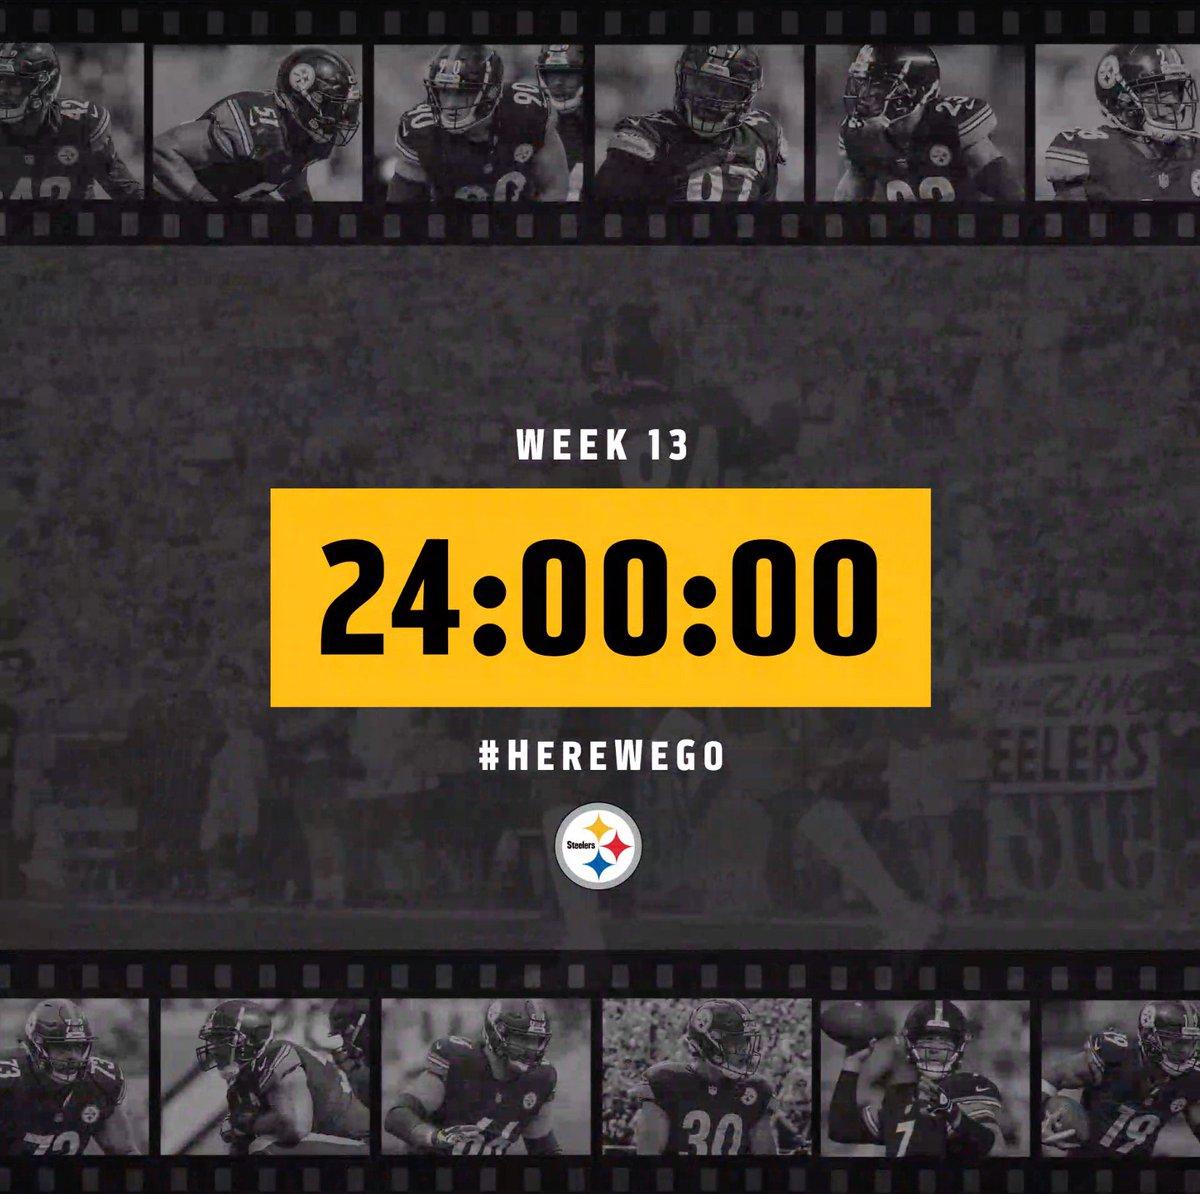 5a8f8ffa 24 hours. #HereWeGo https://t.co/dvJn1E7j8Y - Football - Pittsburgh ...